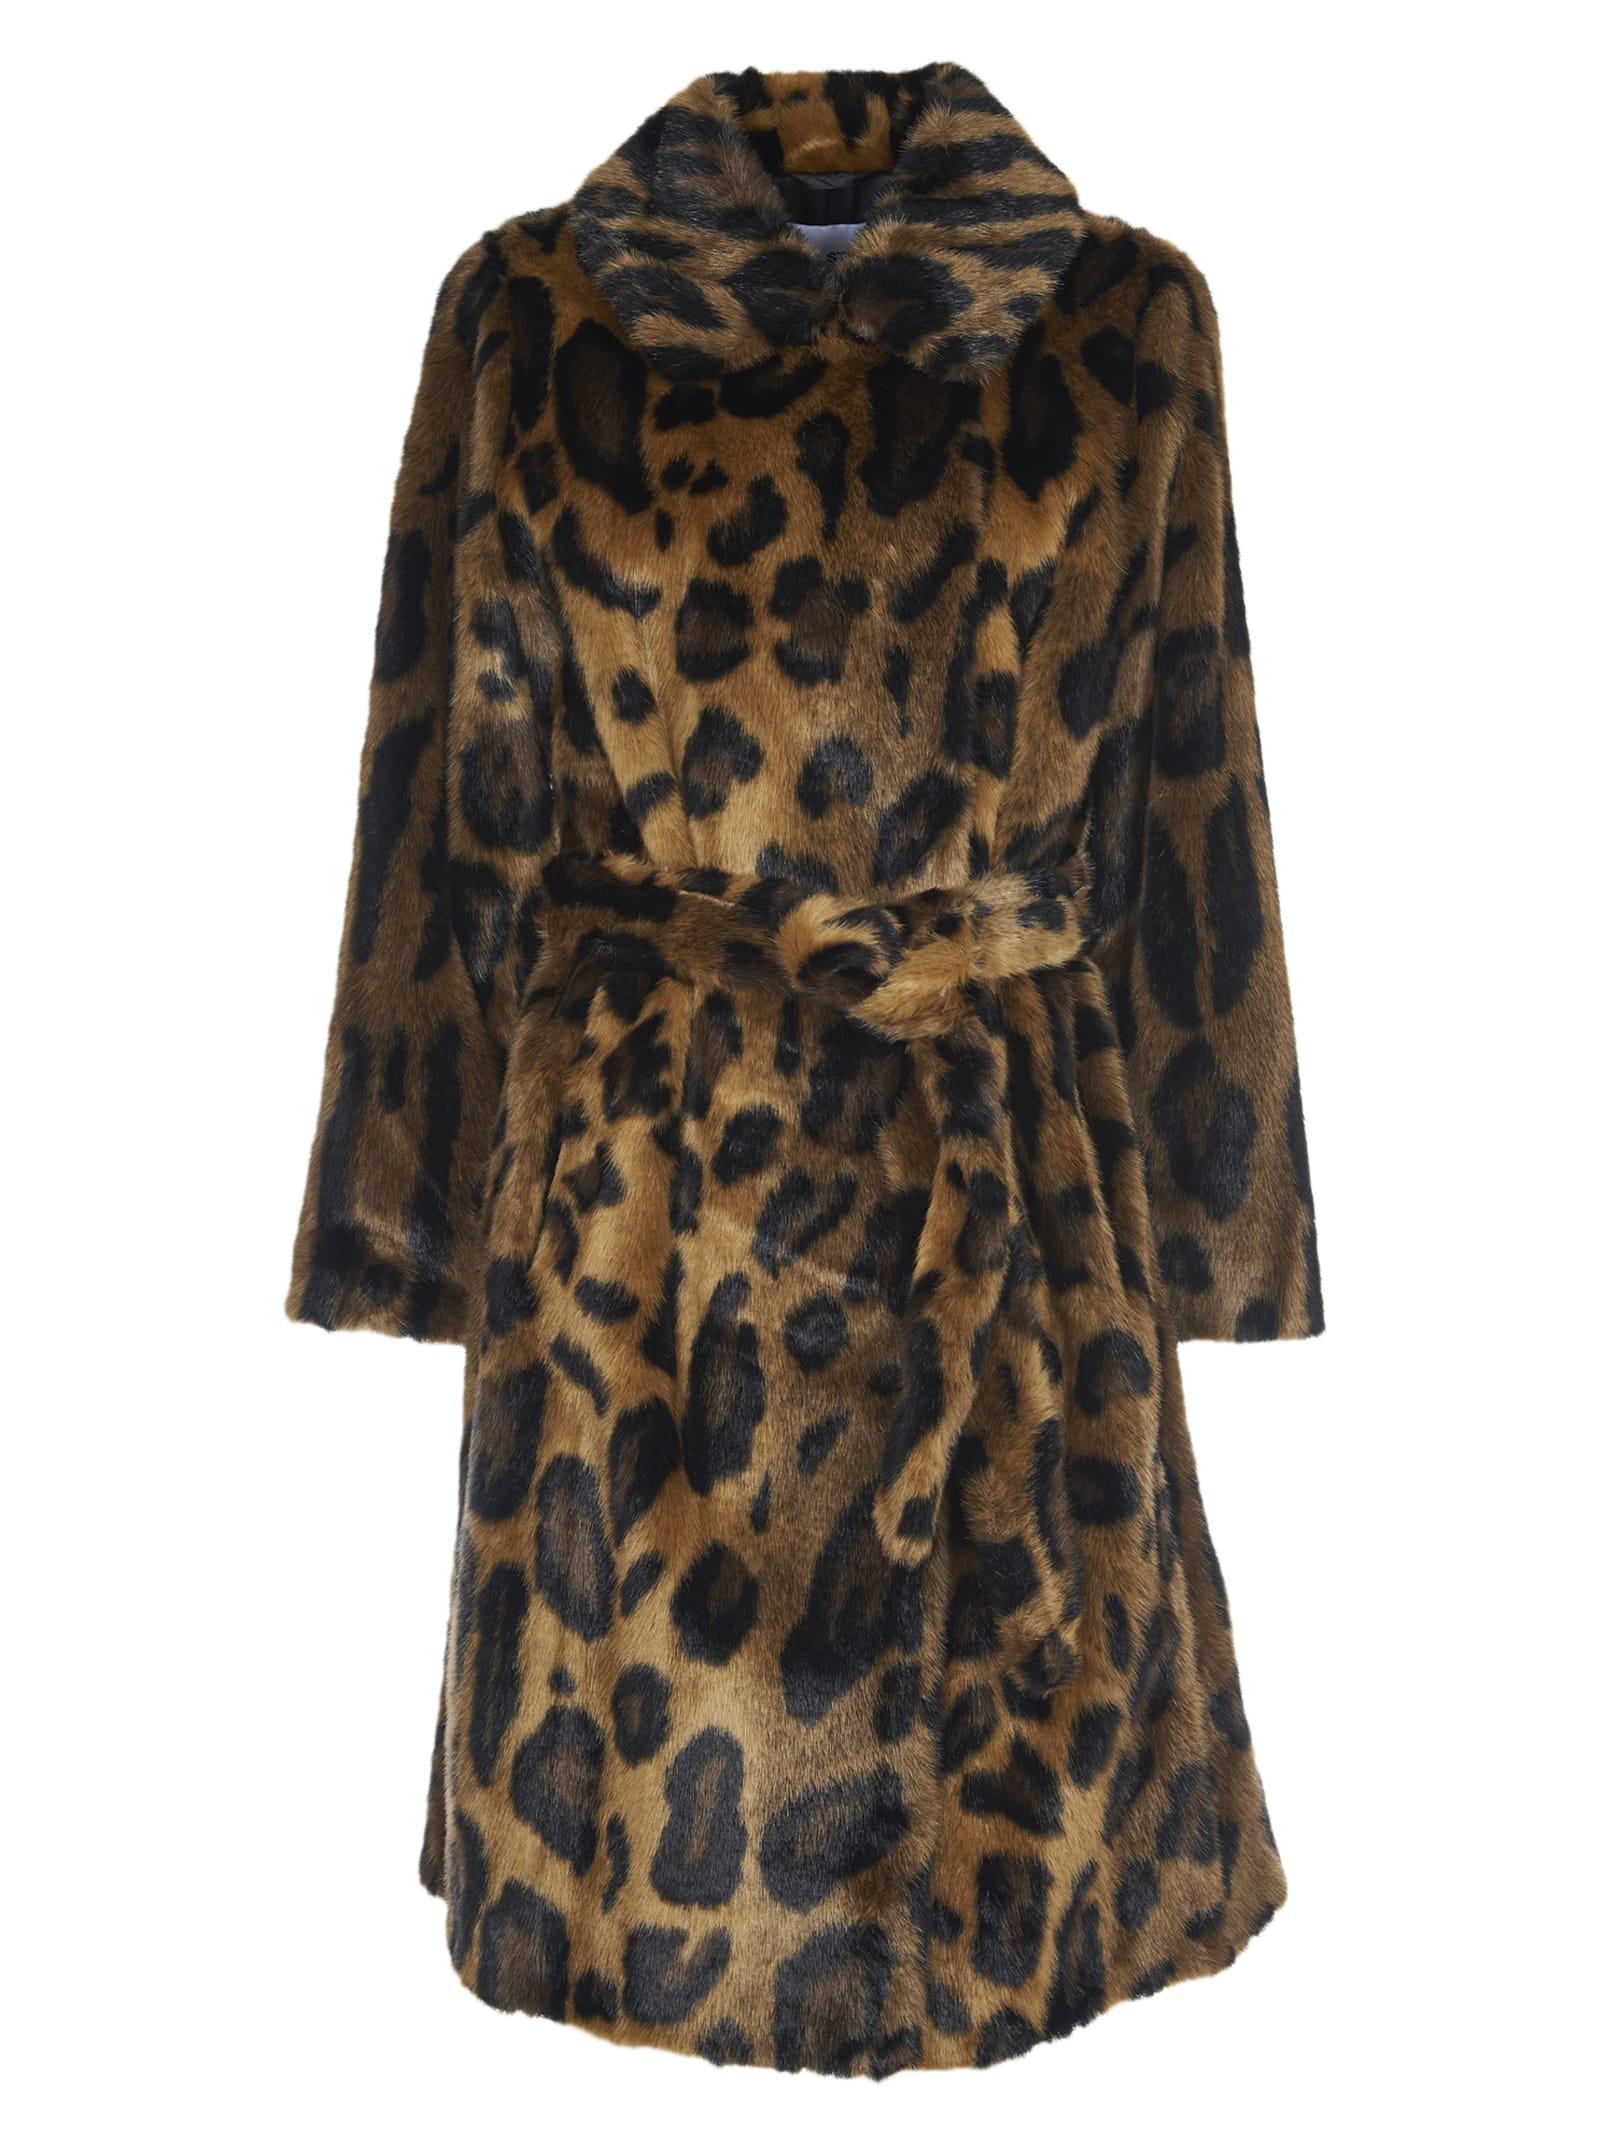 STAND STUDIO irina Leopard Print Coat